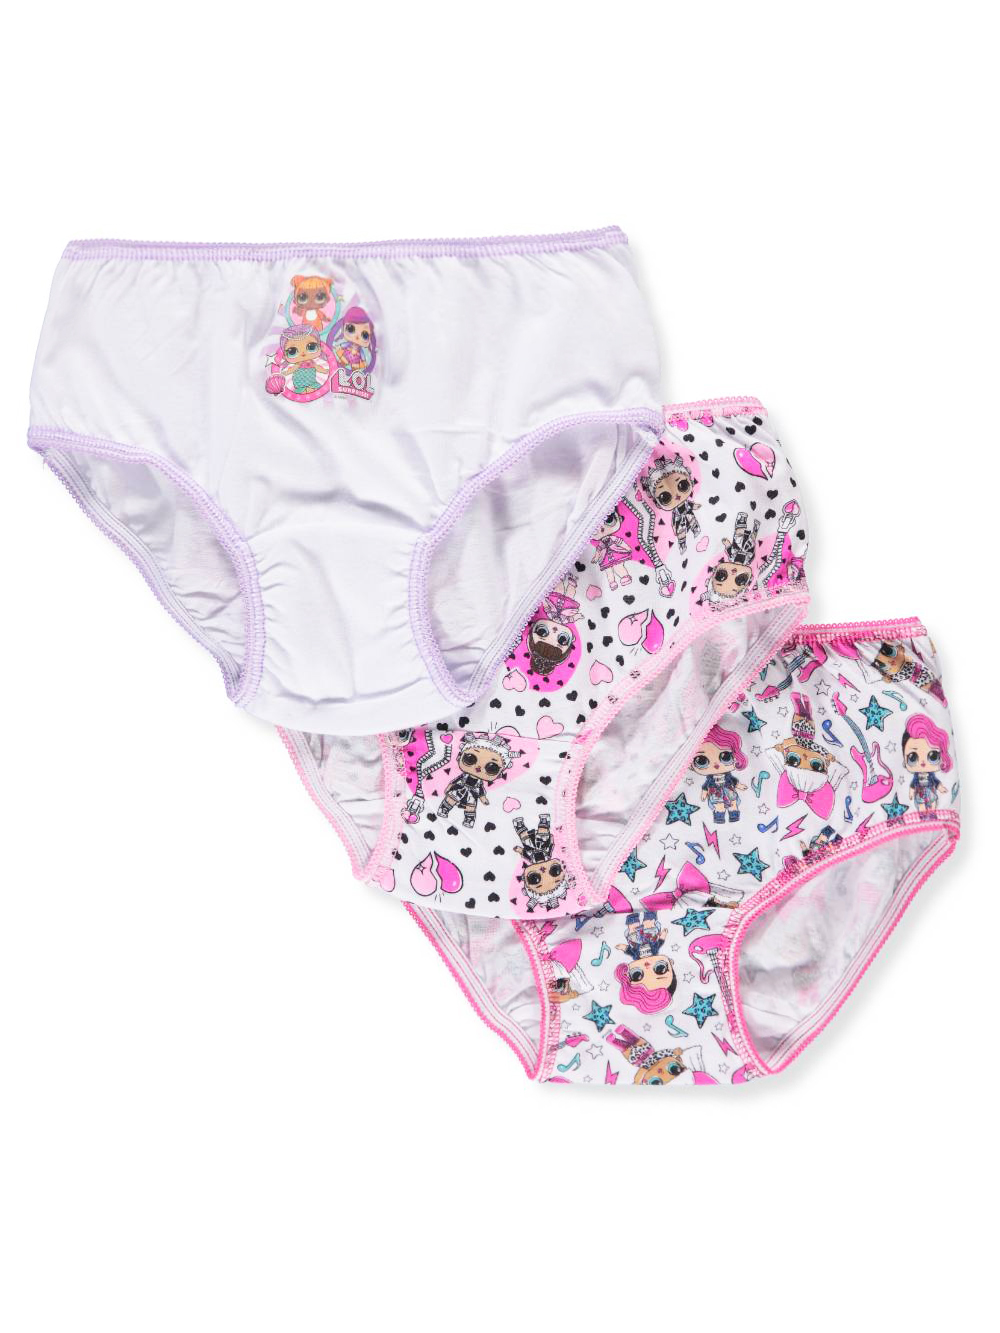 LOL Surprise Girls' 3-Pack Bikini Panties